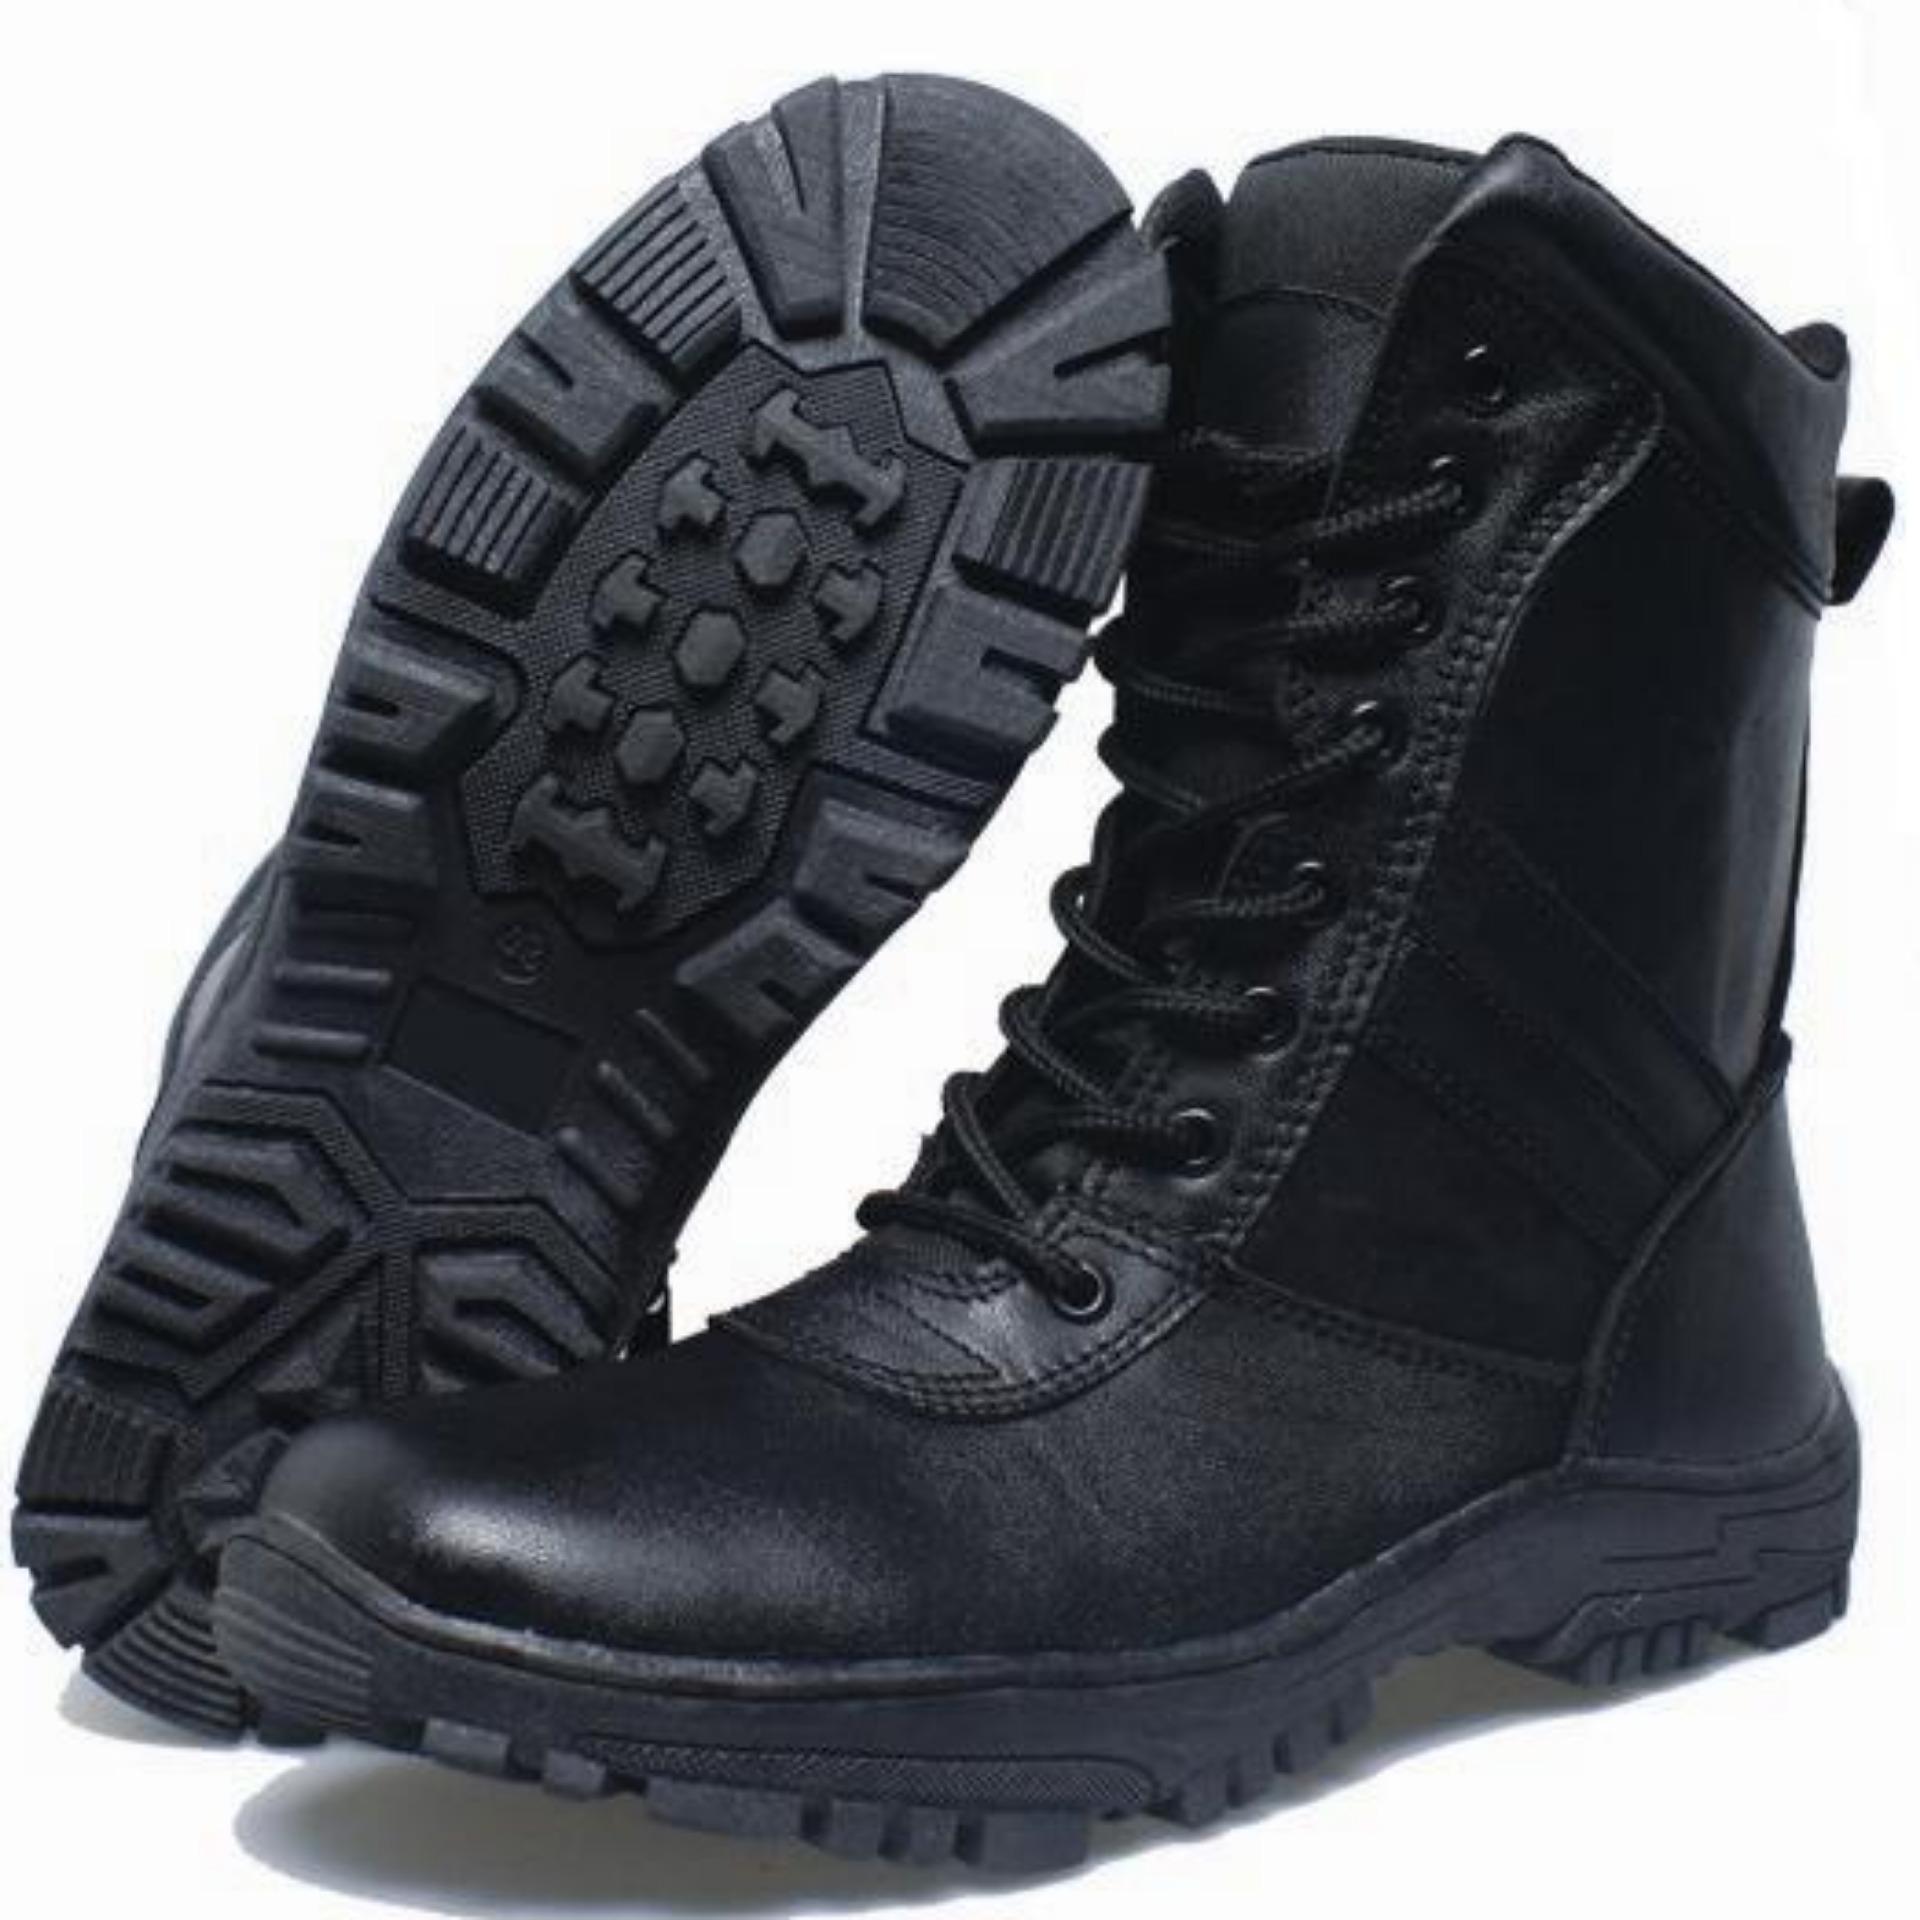 Bsm Soga Sepatu Formal Pantofel Boots Kulit Asli Pdh Pdl Kerjakantor 275 Kerja Pria Elegan Hitam Kantor Source Boot Touring Bikers Outdoorhiking Lapangan Best